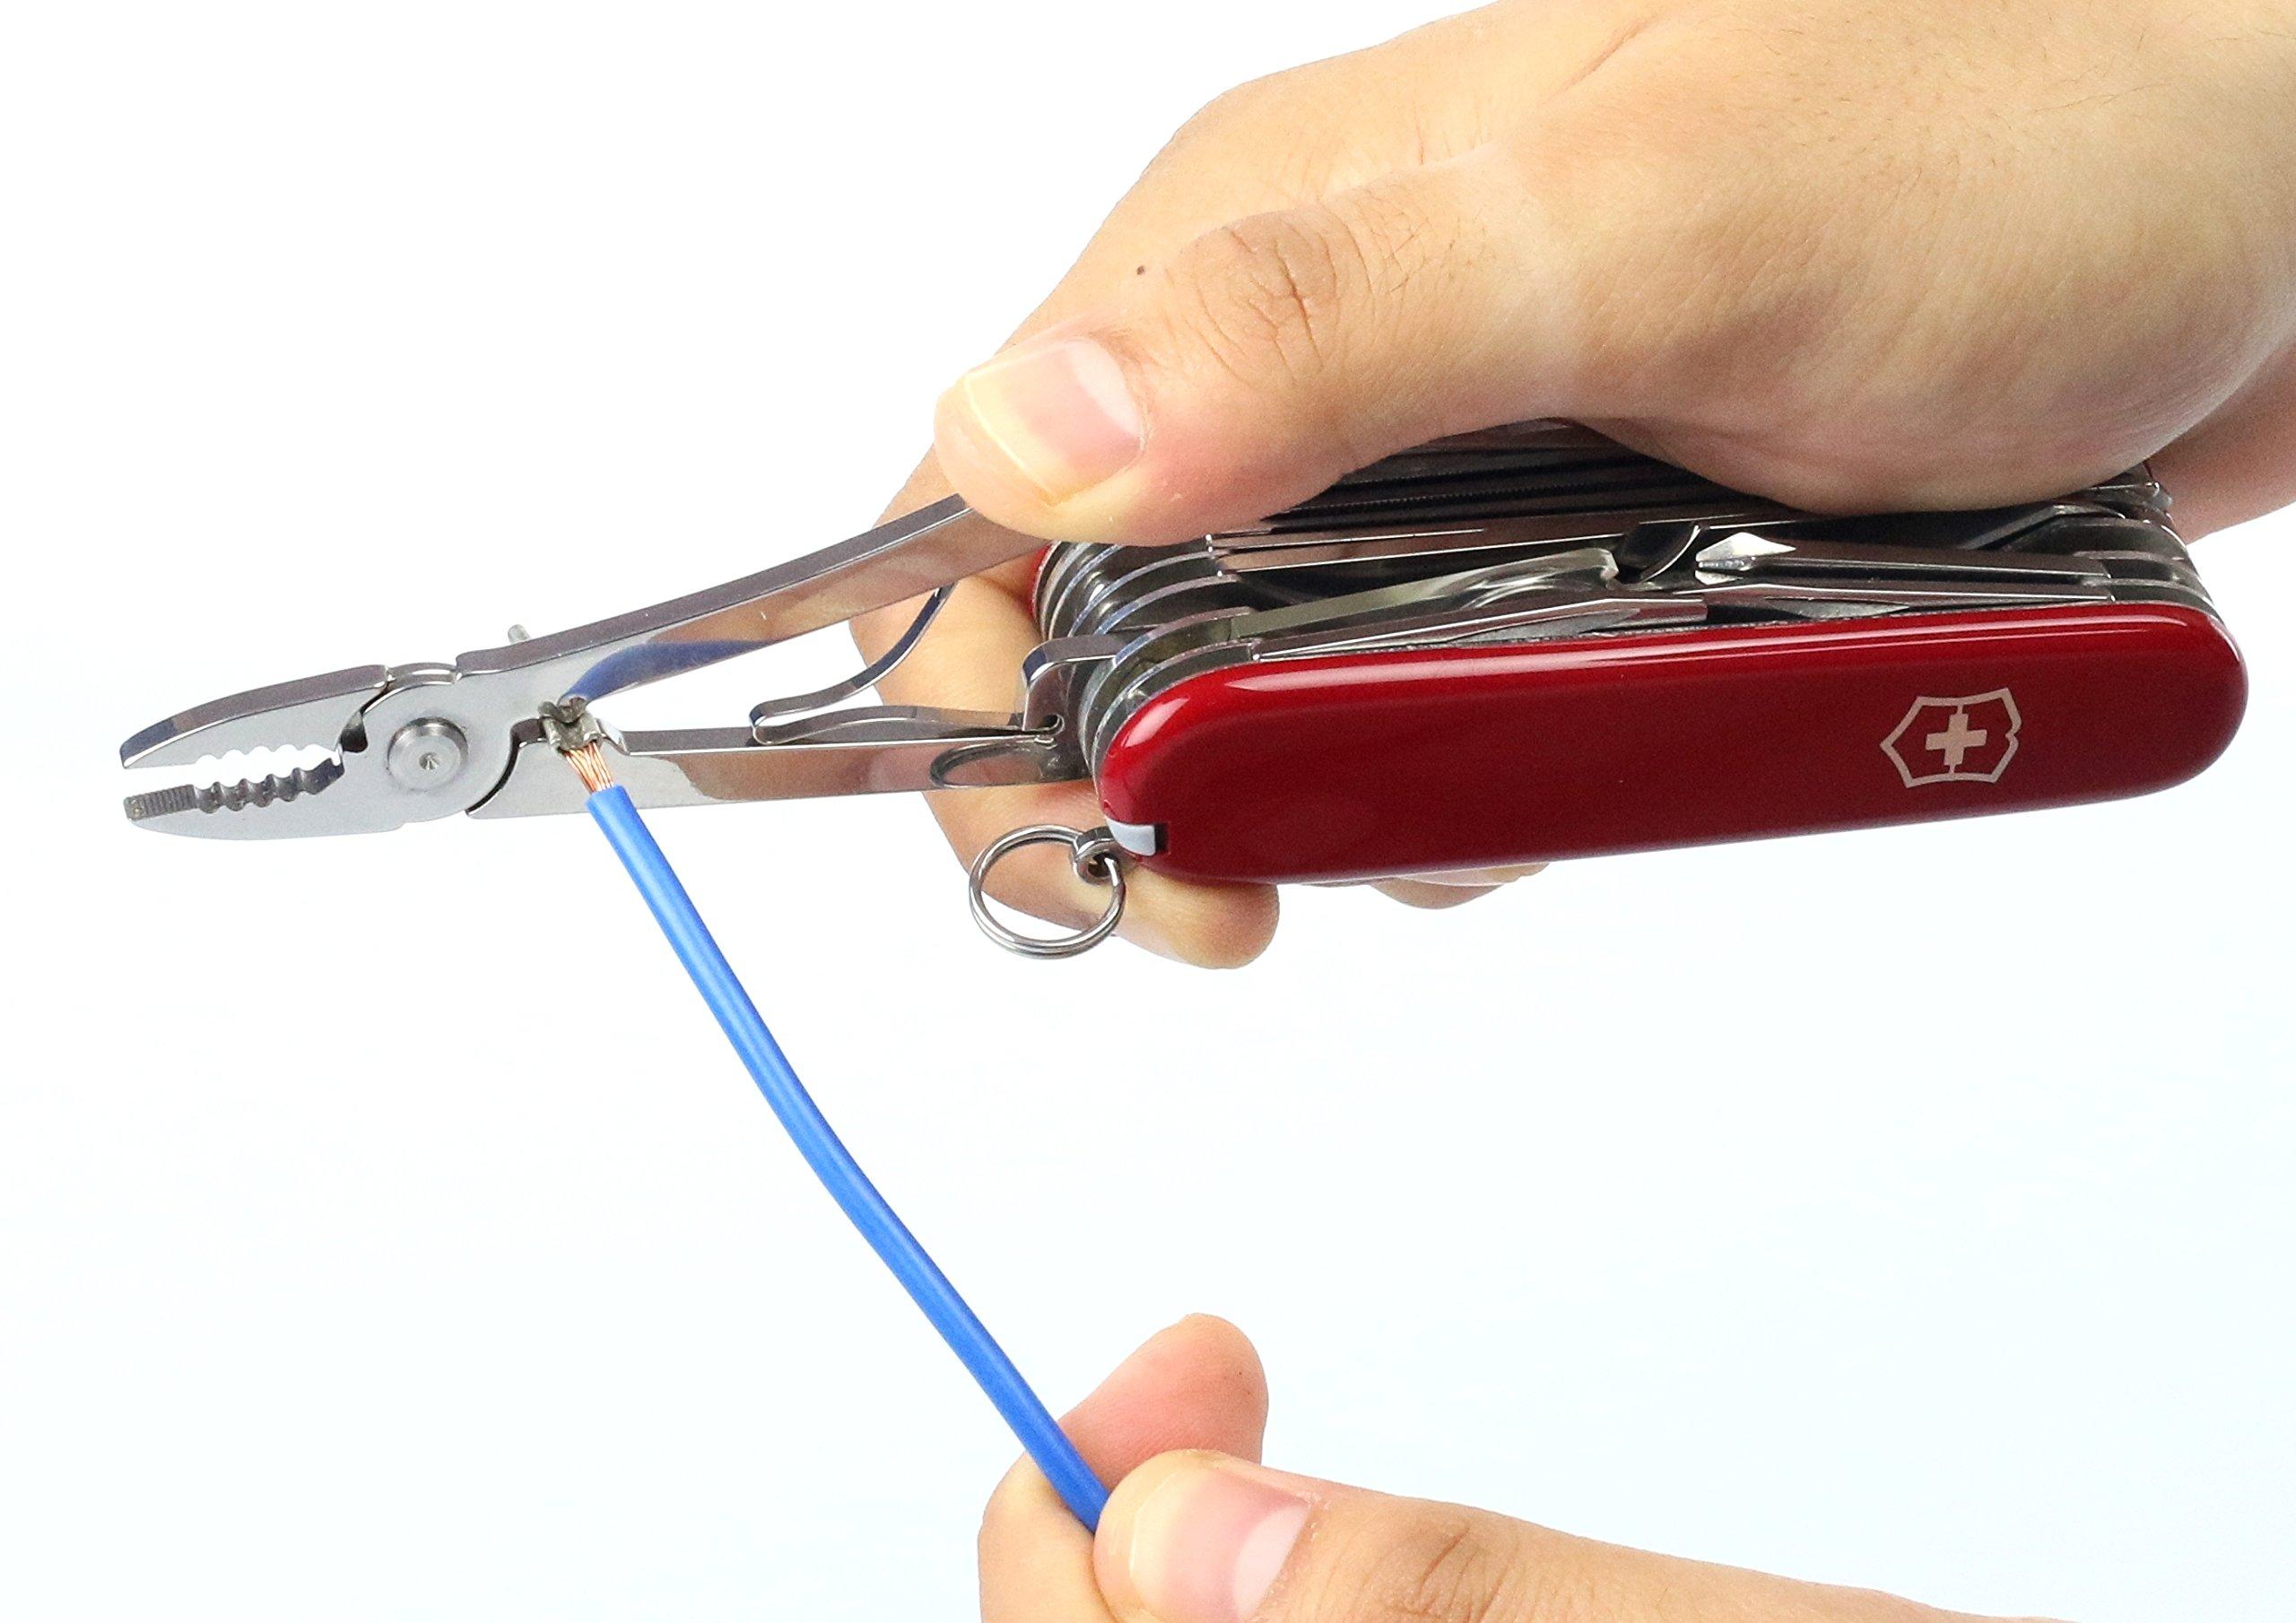 Victorinox Swiss Champ Swiss Army Pocket Knife, Medium, Multi Tool, 33 Functions, Blade, Scissors, Red 35